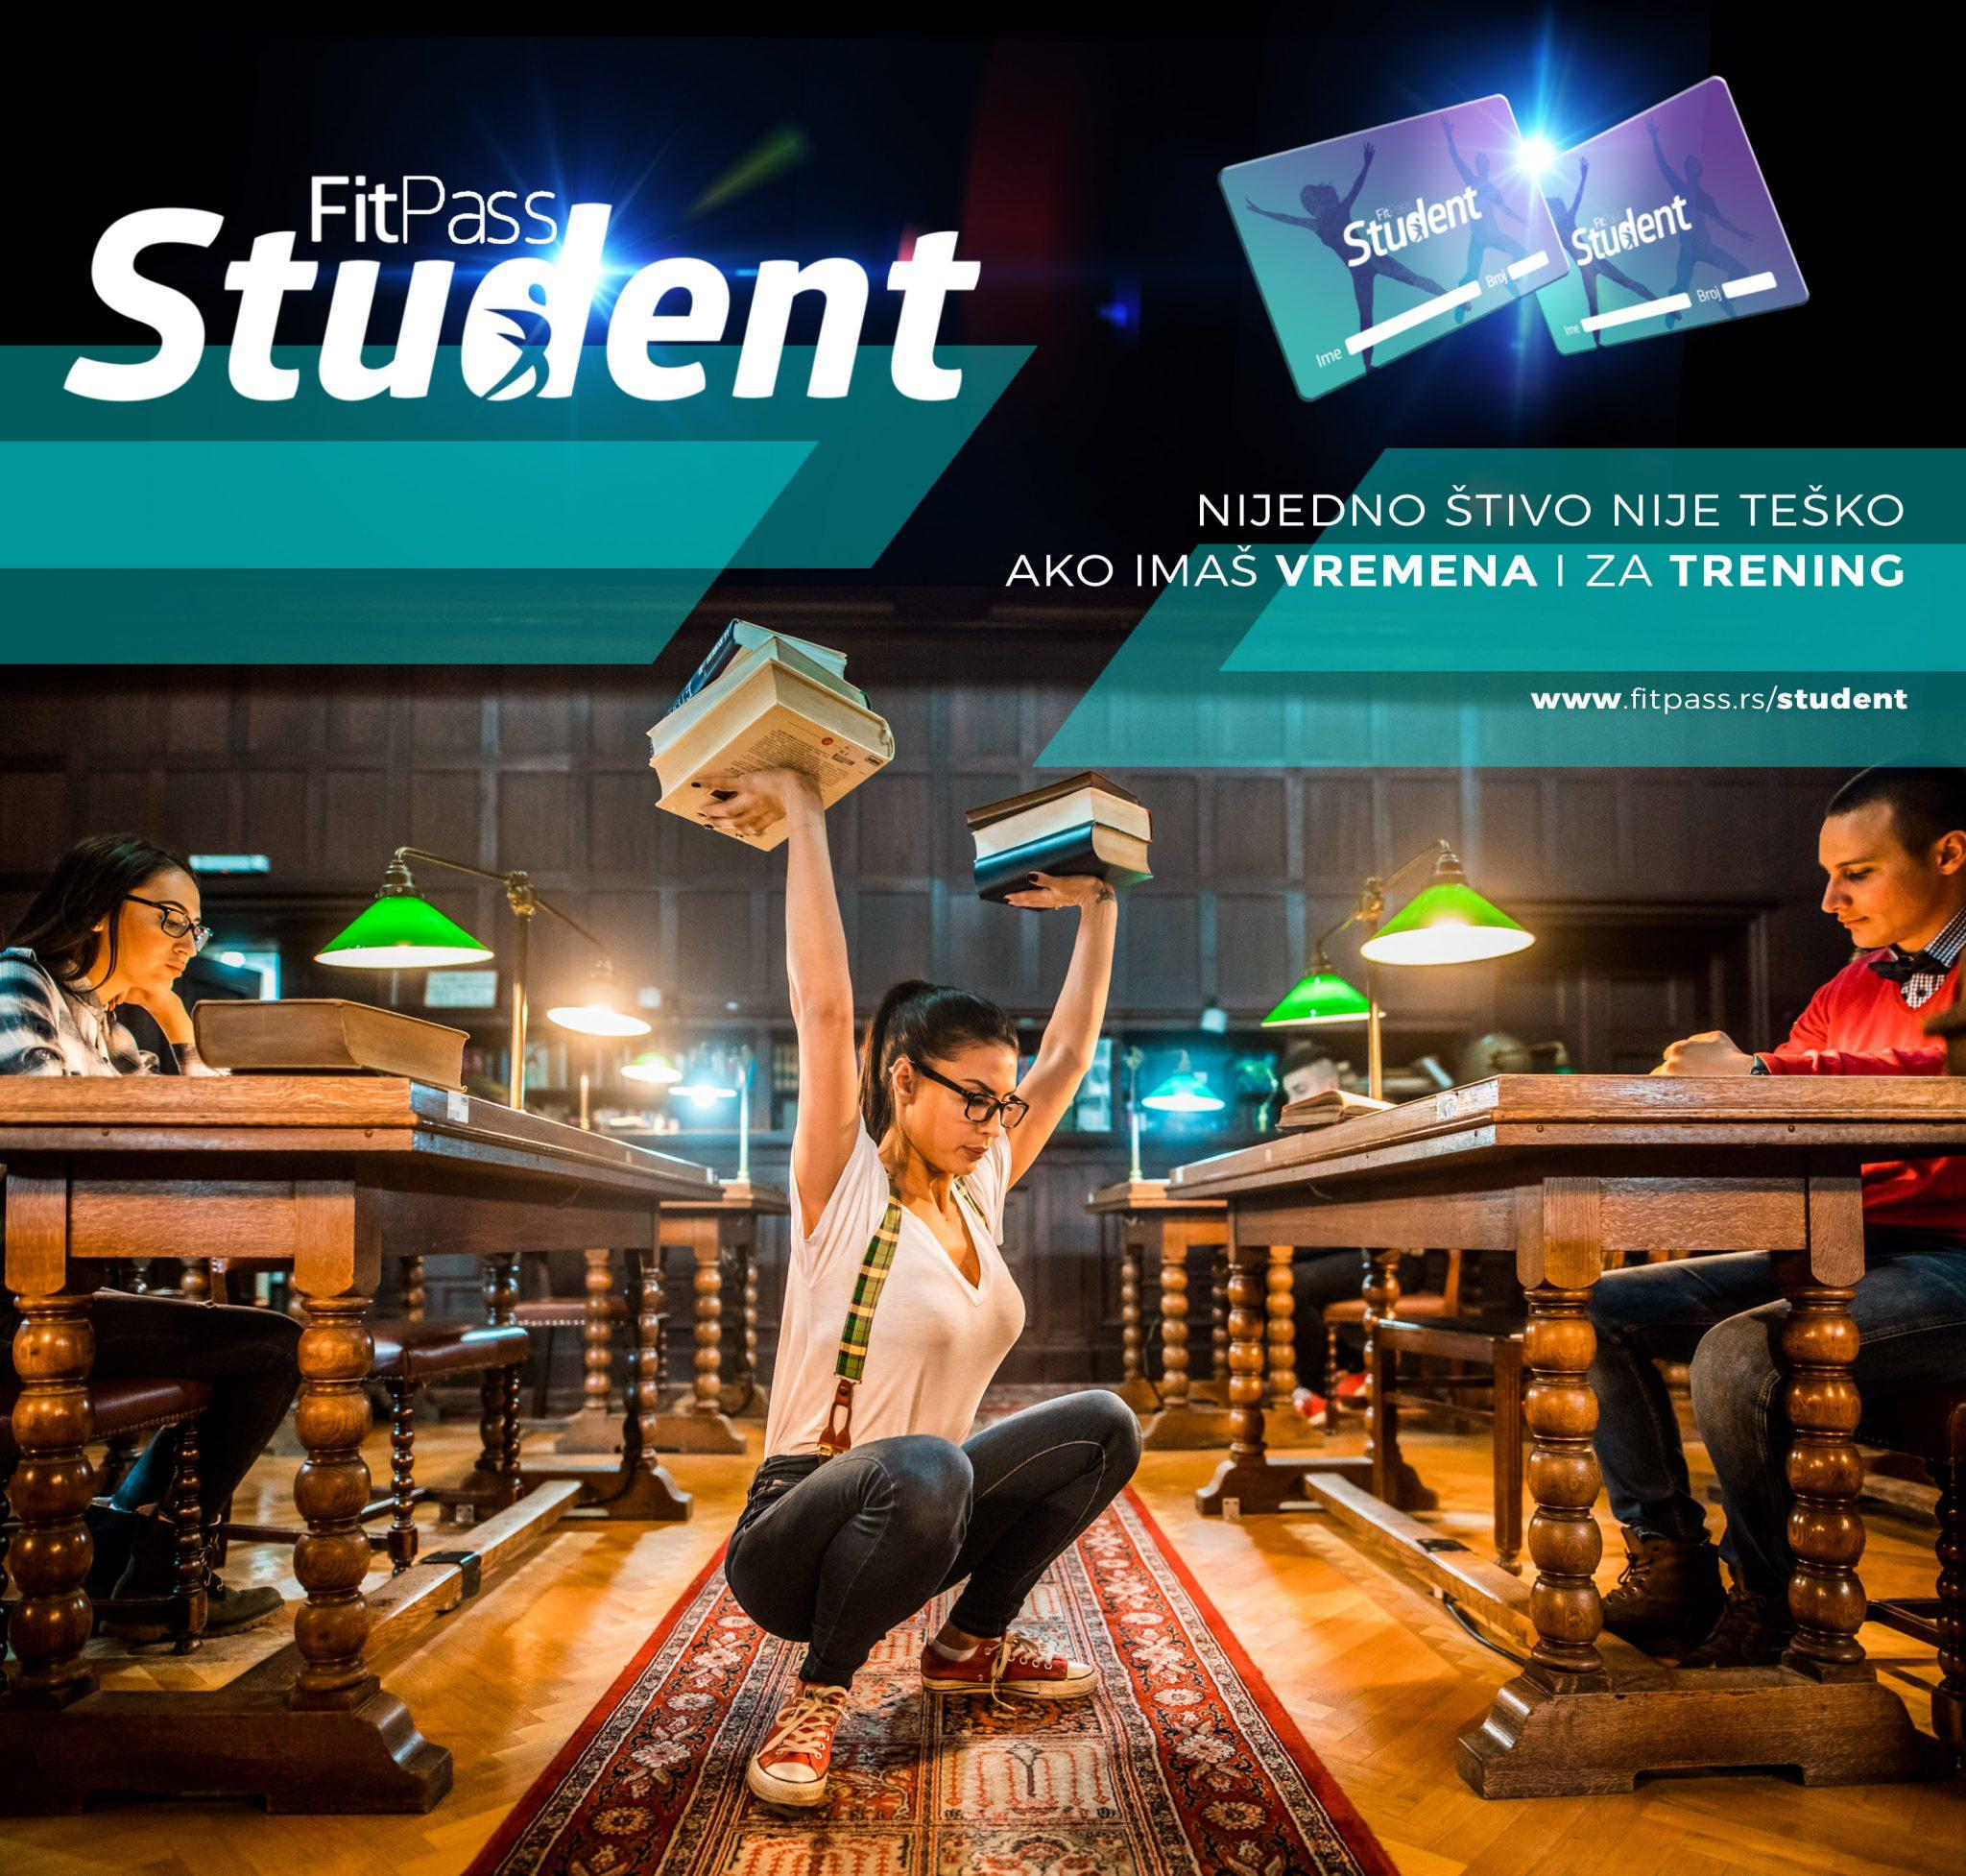 FitPass Student